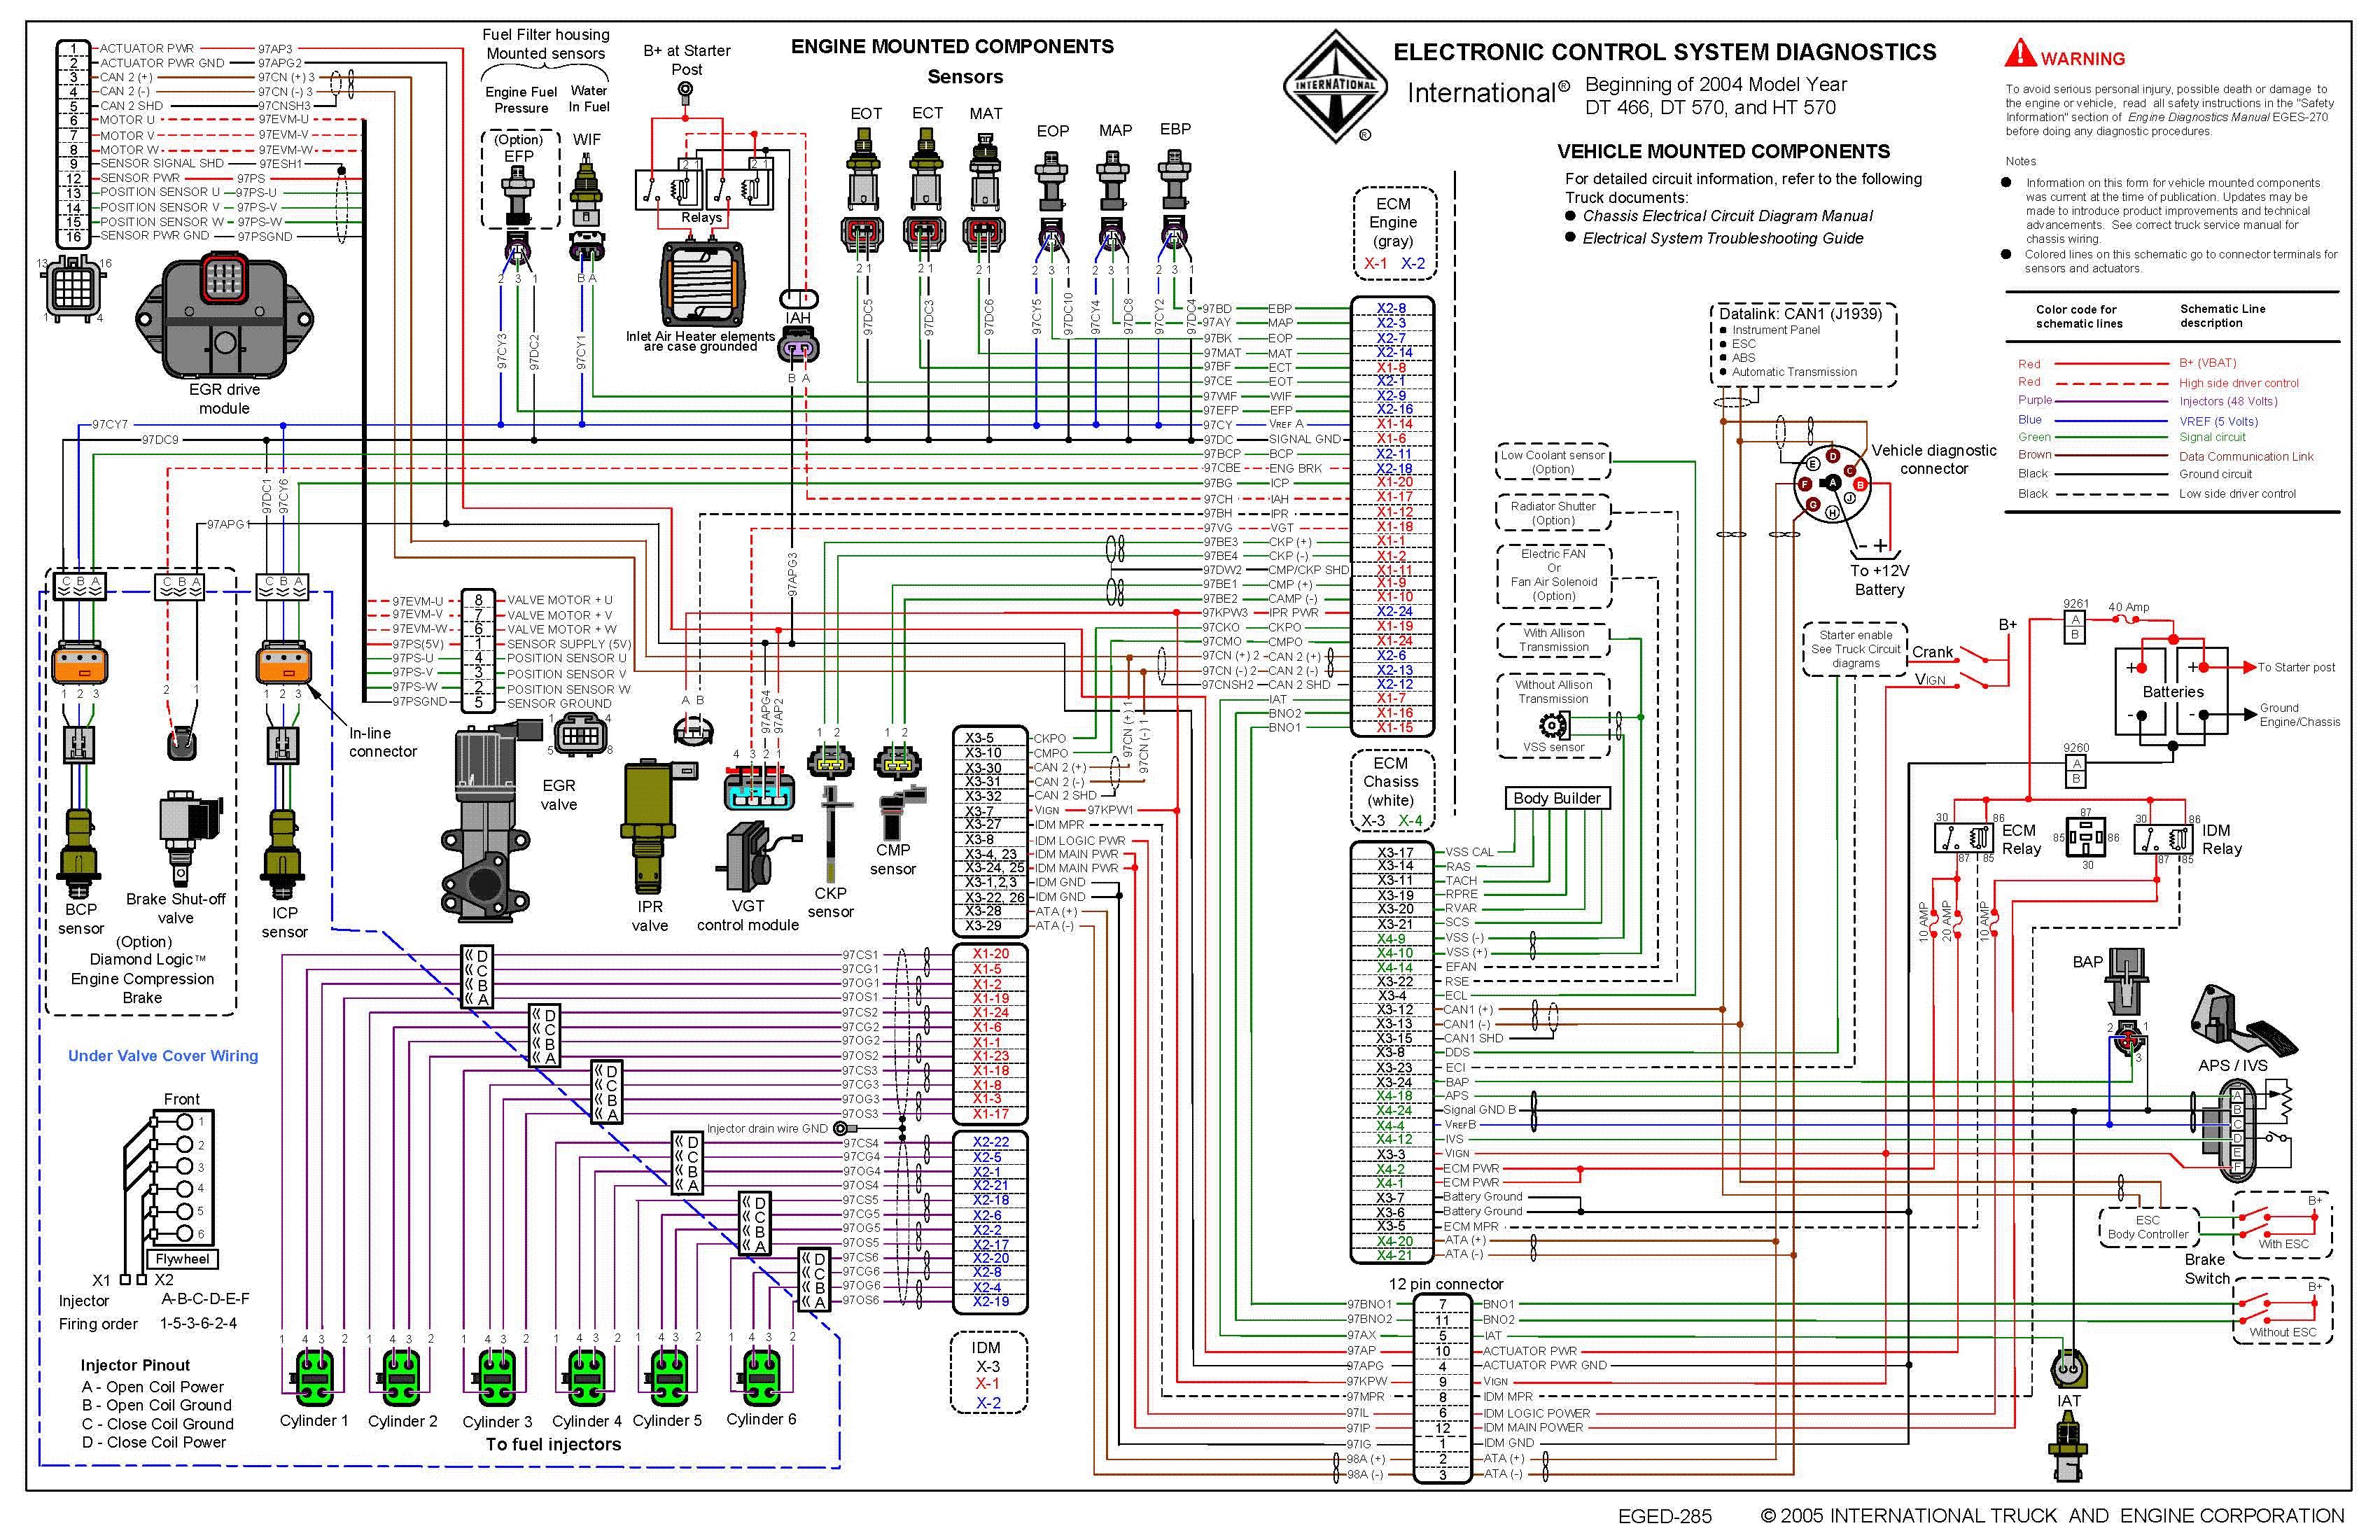 international truck wiring diagrams free premium wiring diagram bloginternational heavy truck wiring diagrams wiring diagram db